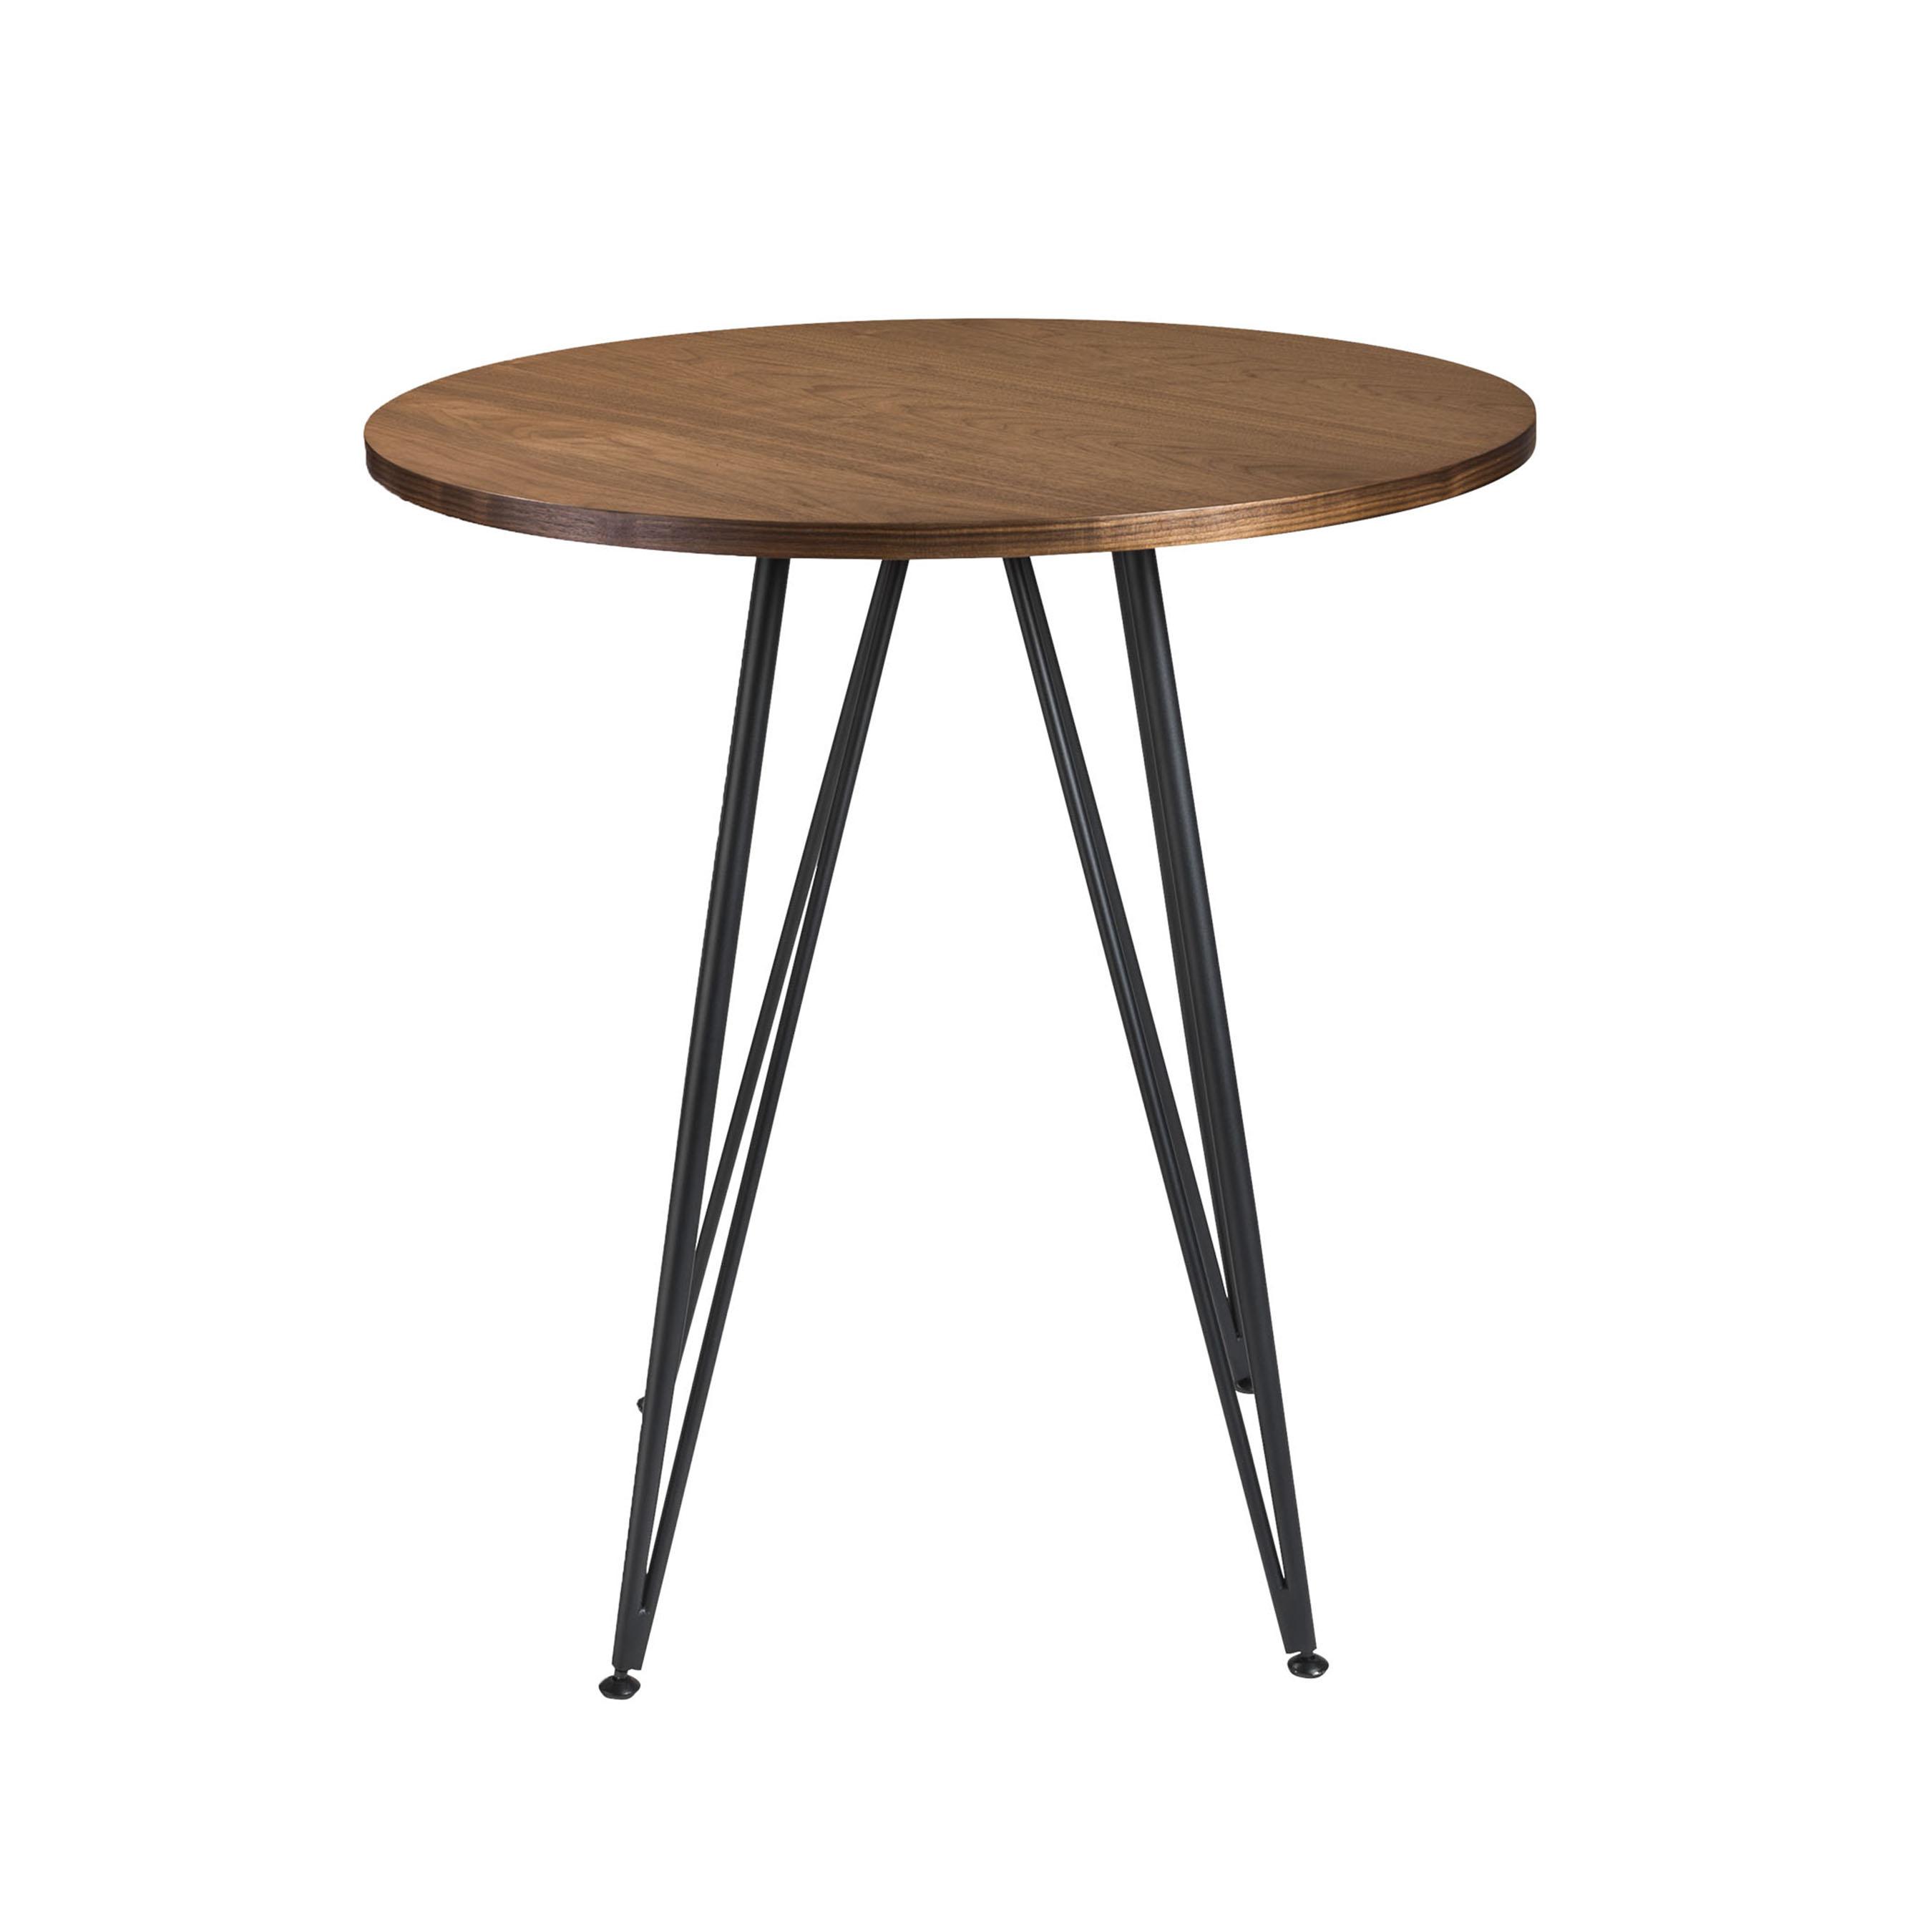 Amir 36 Inch Counter Table 38693WAL KIT